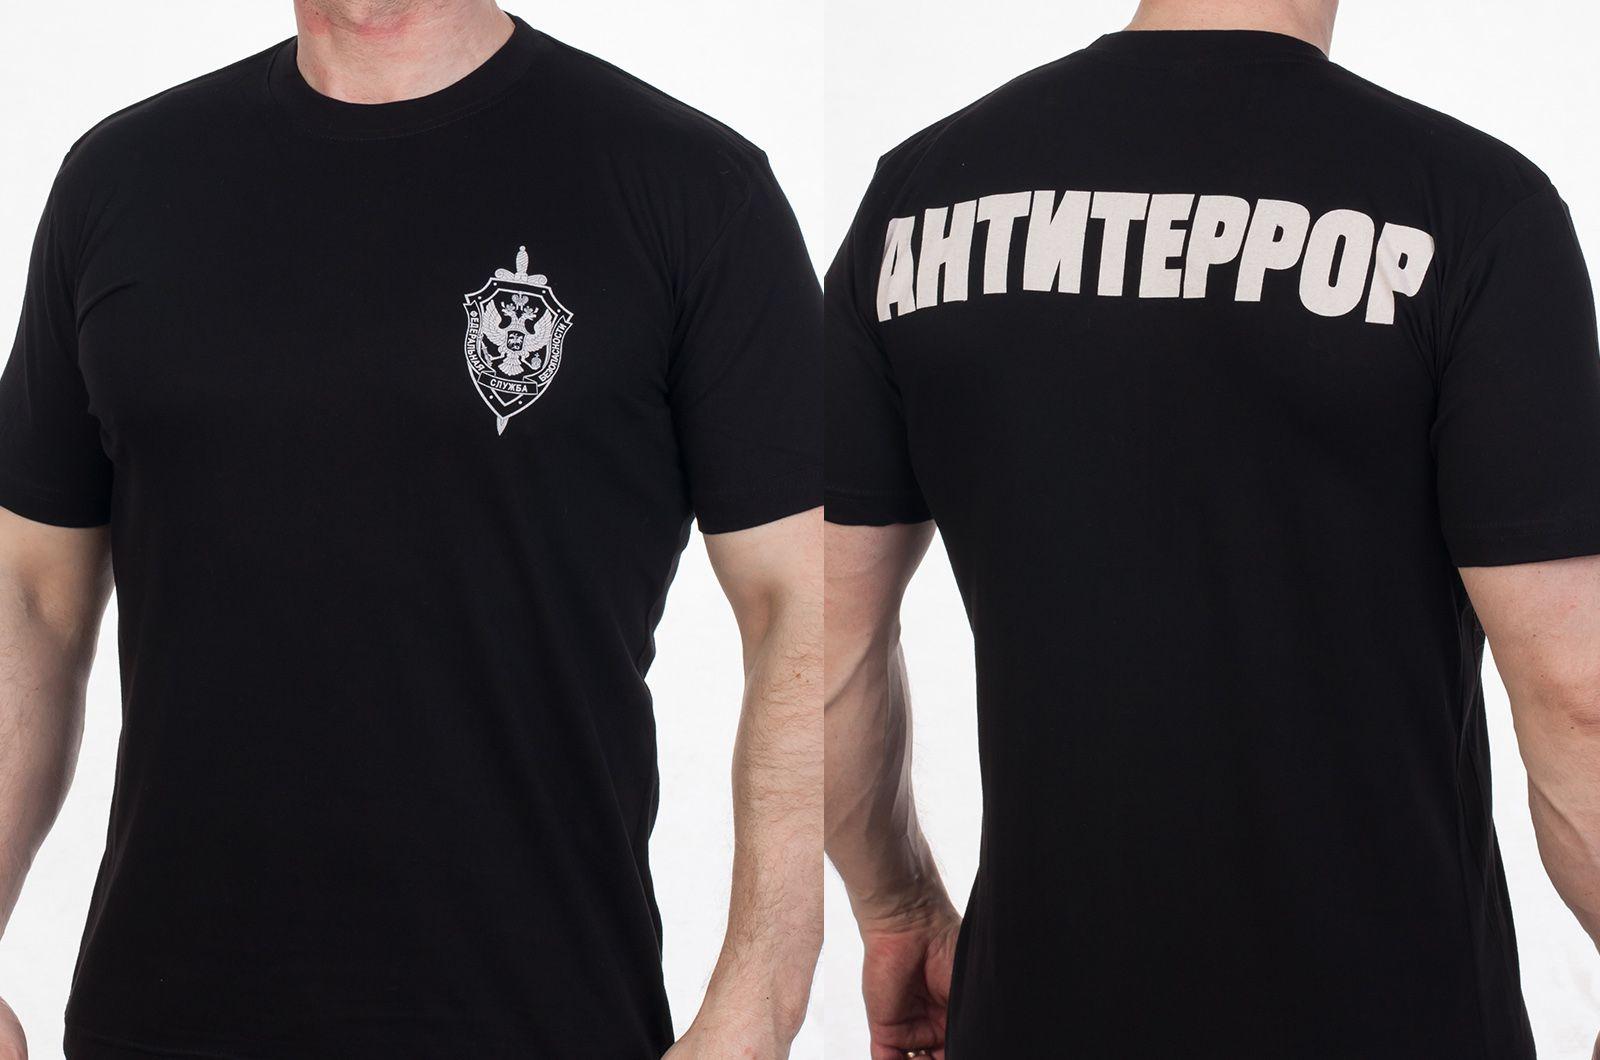 Футболка ФСБ «Антитеррор» - общий вид